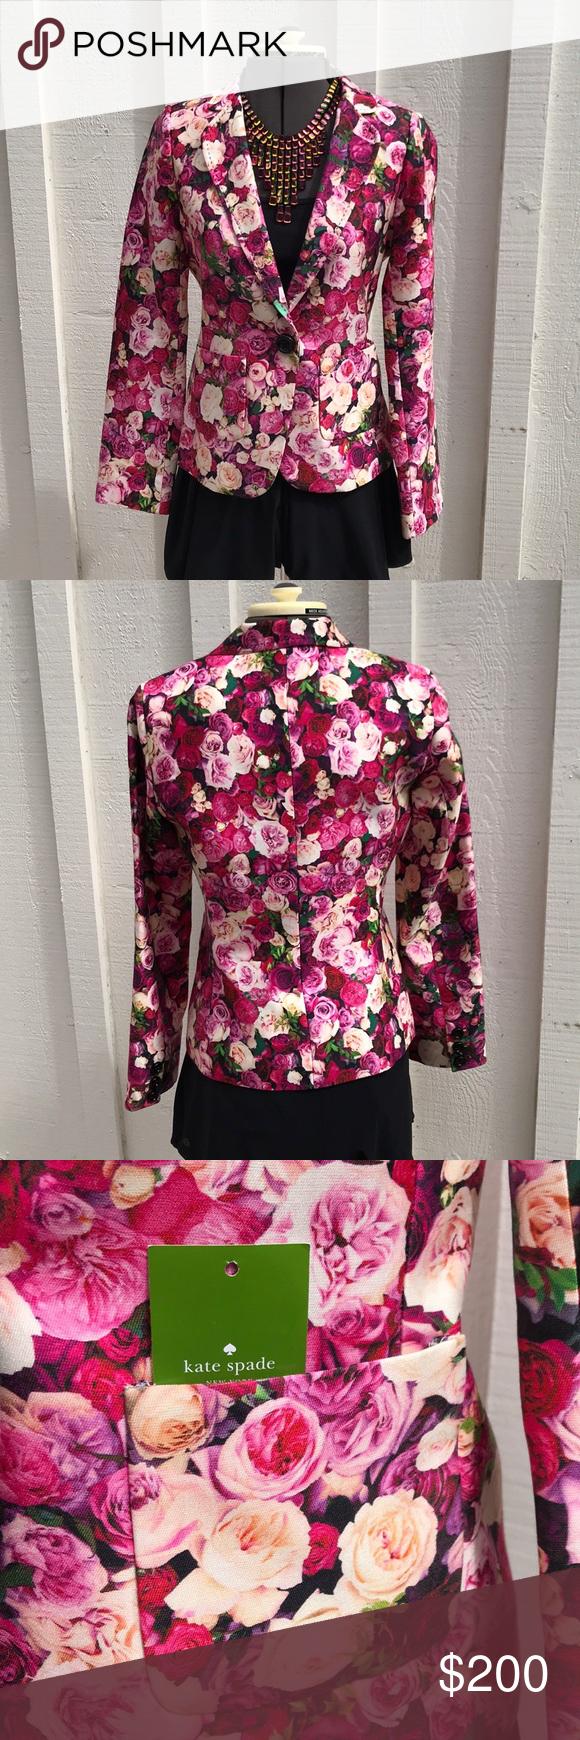 a1ead461 Kate Spade Rose Print Millie Blazer 🌹🌹 Adorable rose print blazer. Length